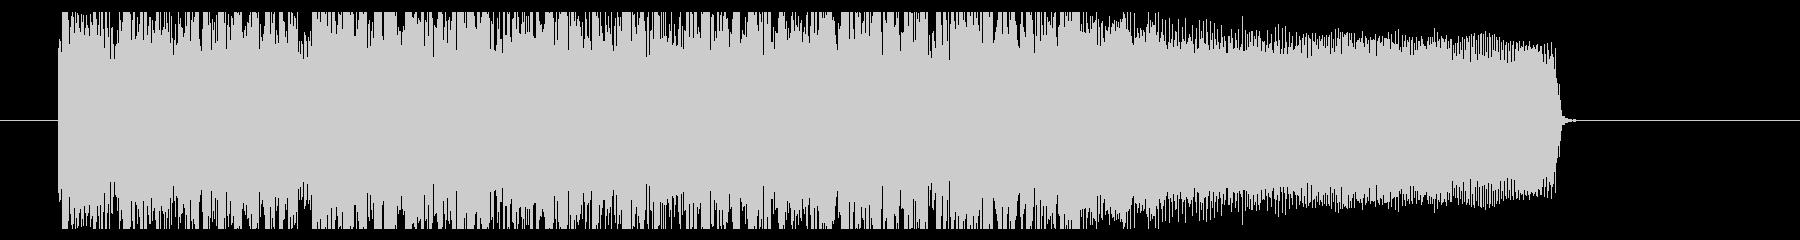 HR/HM bpm140 16分ザクザクの未再生の波形